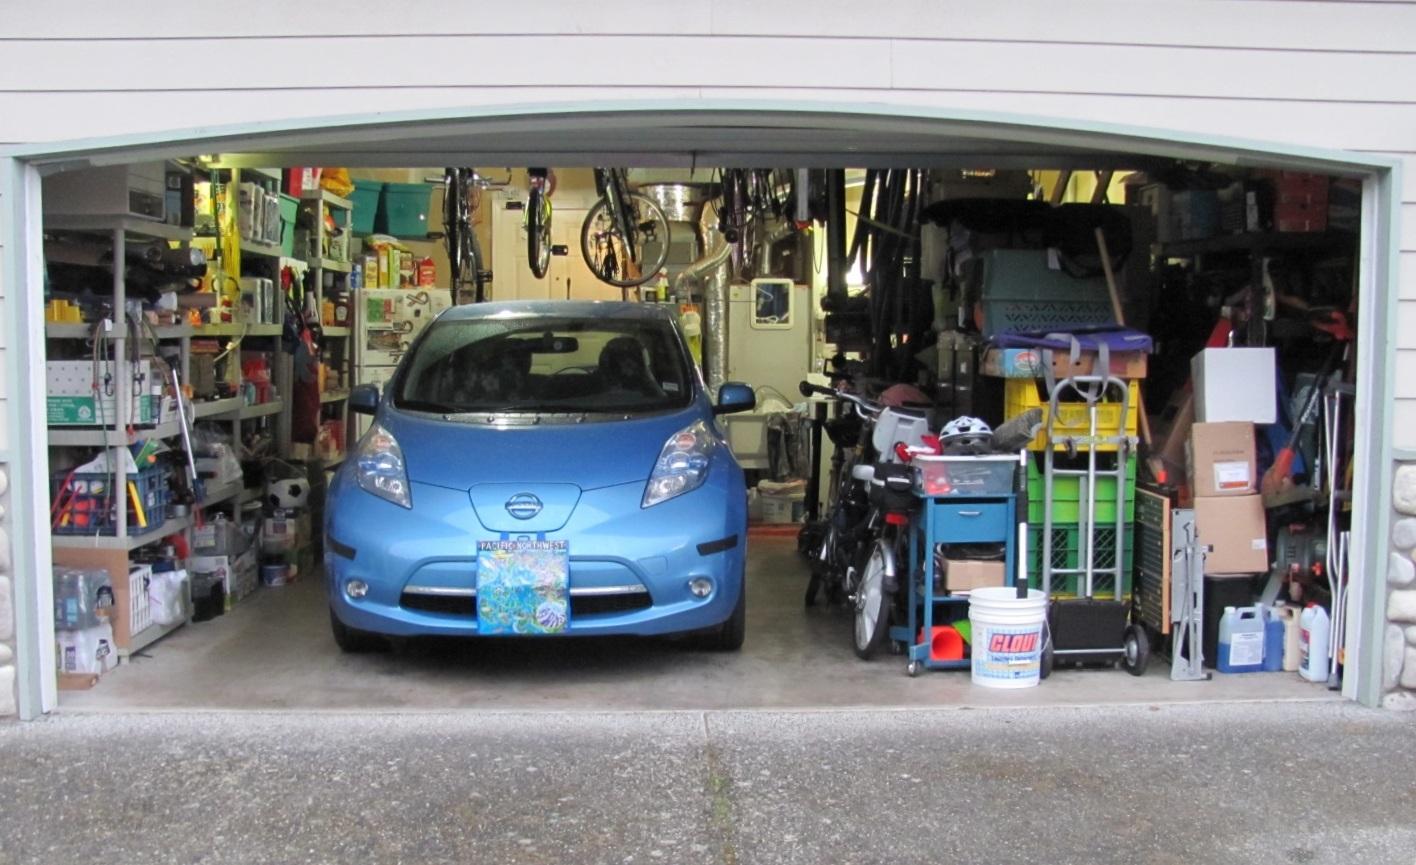 What's in Your Garage? - Sightline Institute